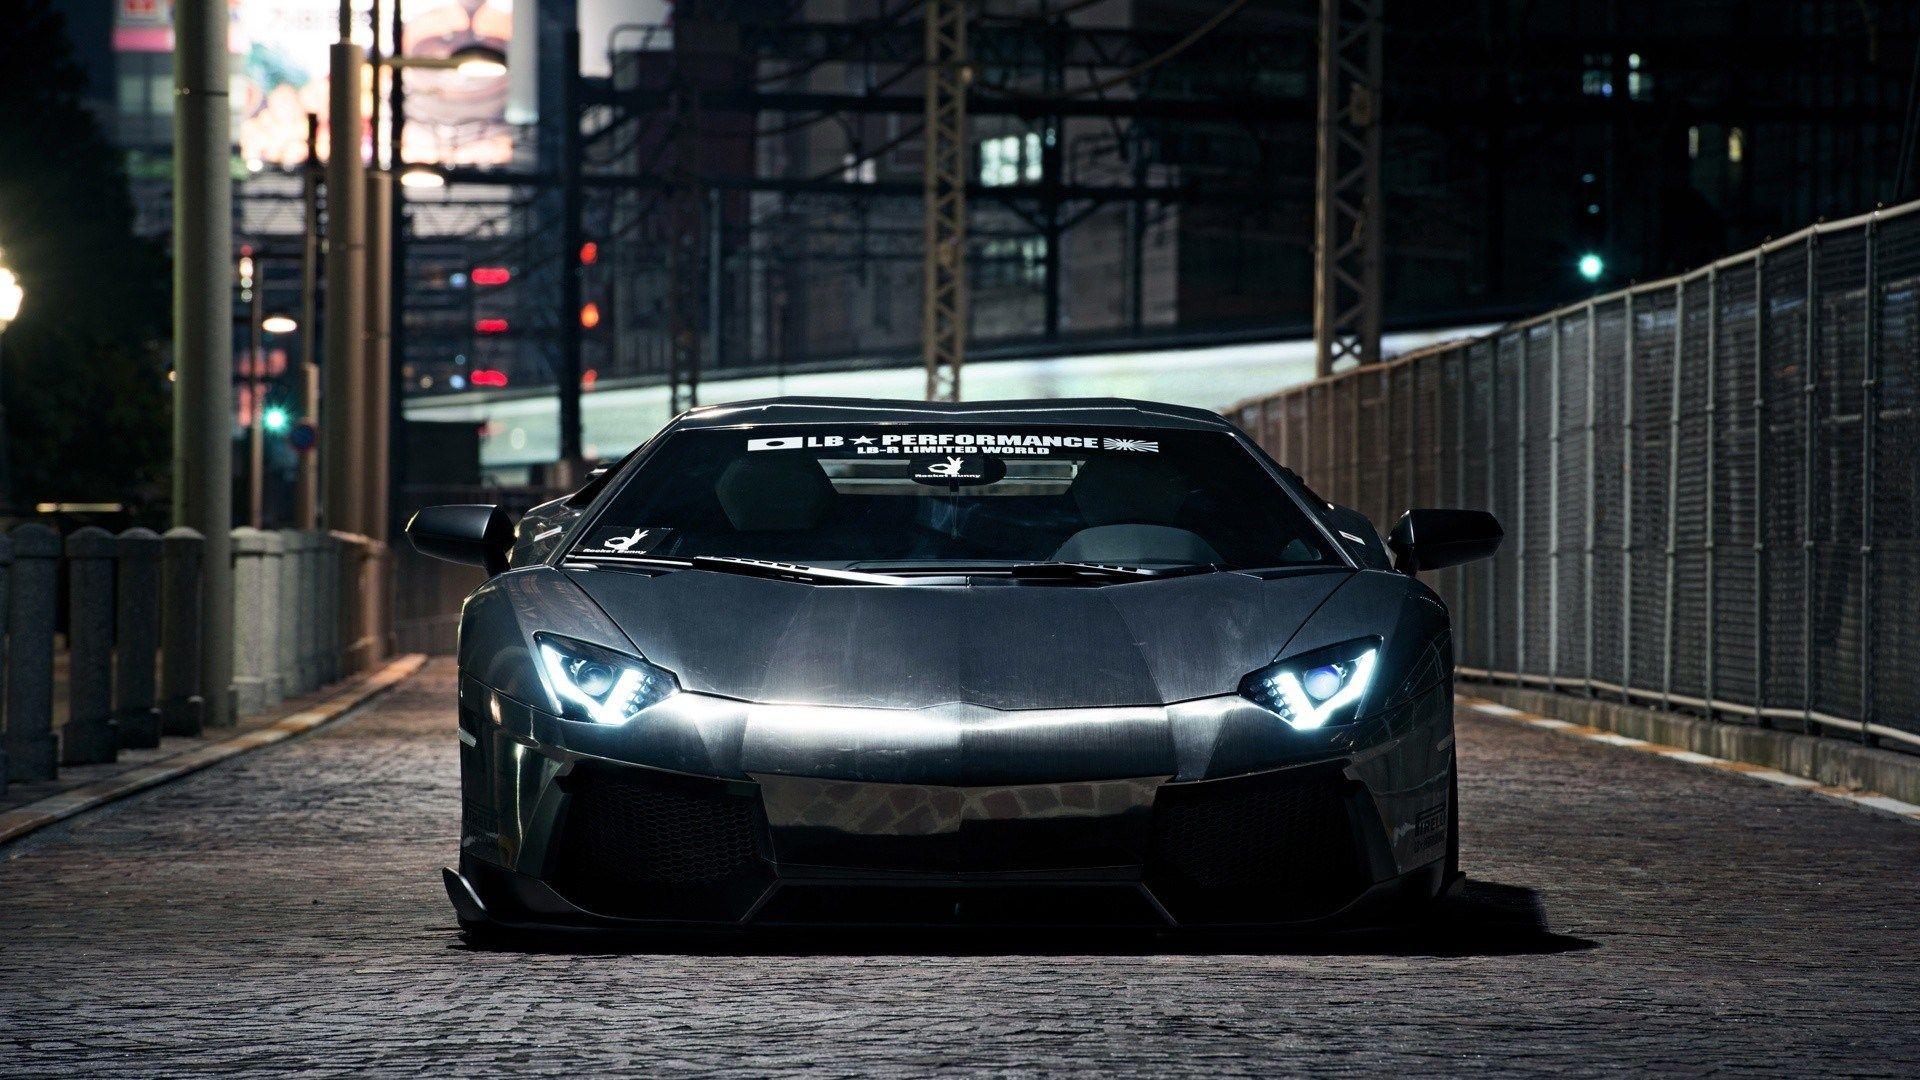 Simple Wallpaper High Resolution Lamborghini Aventador - 99b8857553facb0c7fea62abdf2488e1  Graphic_956387.jpg